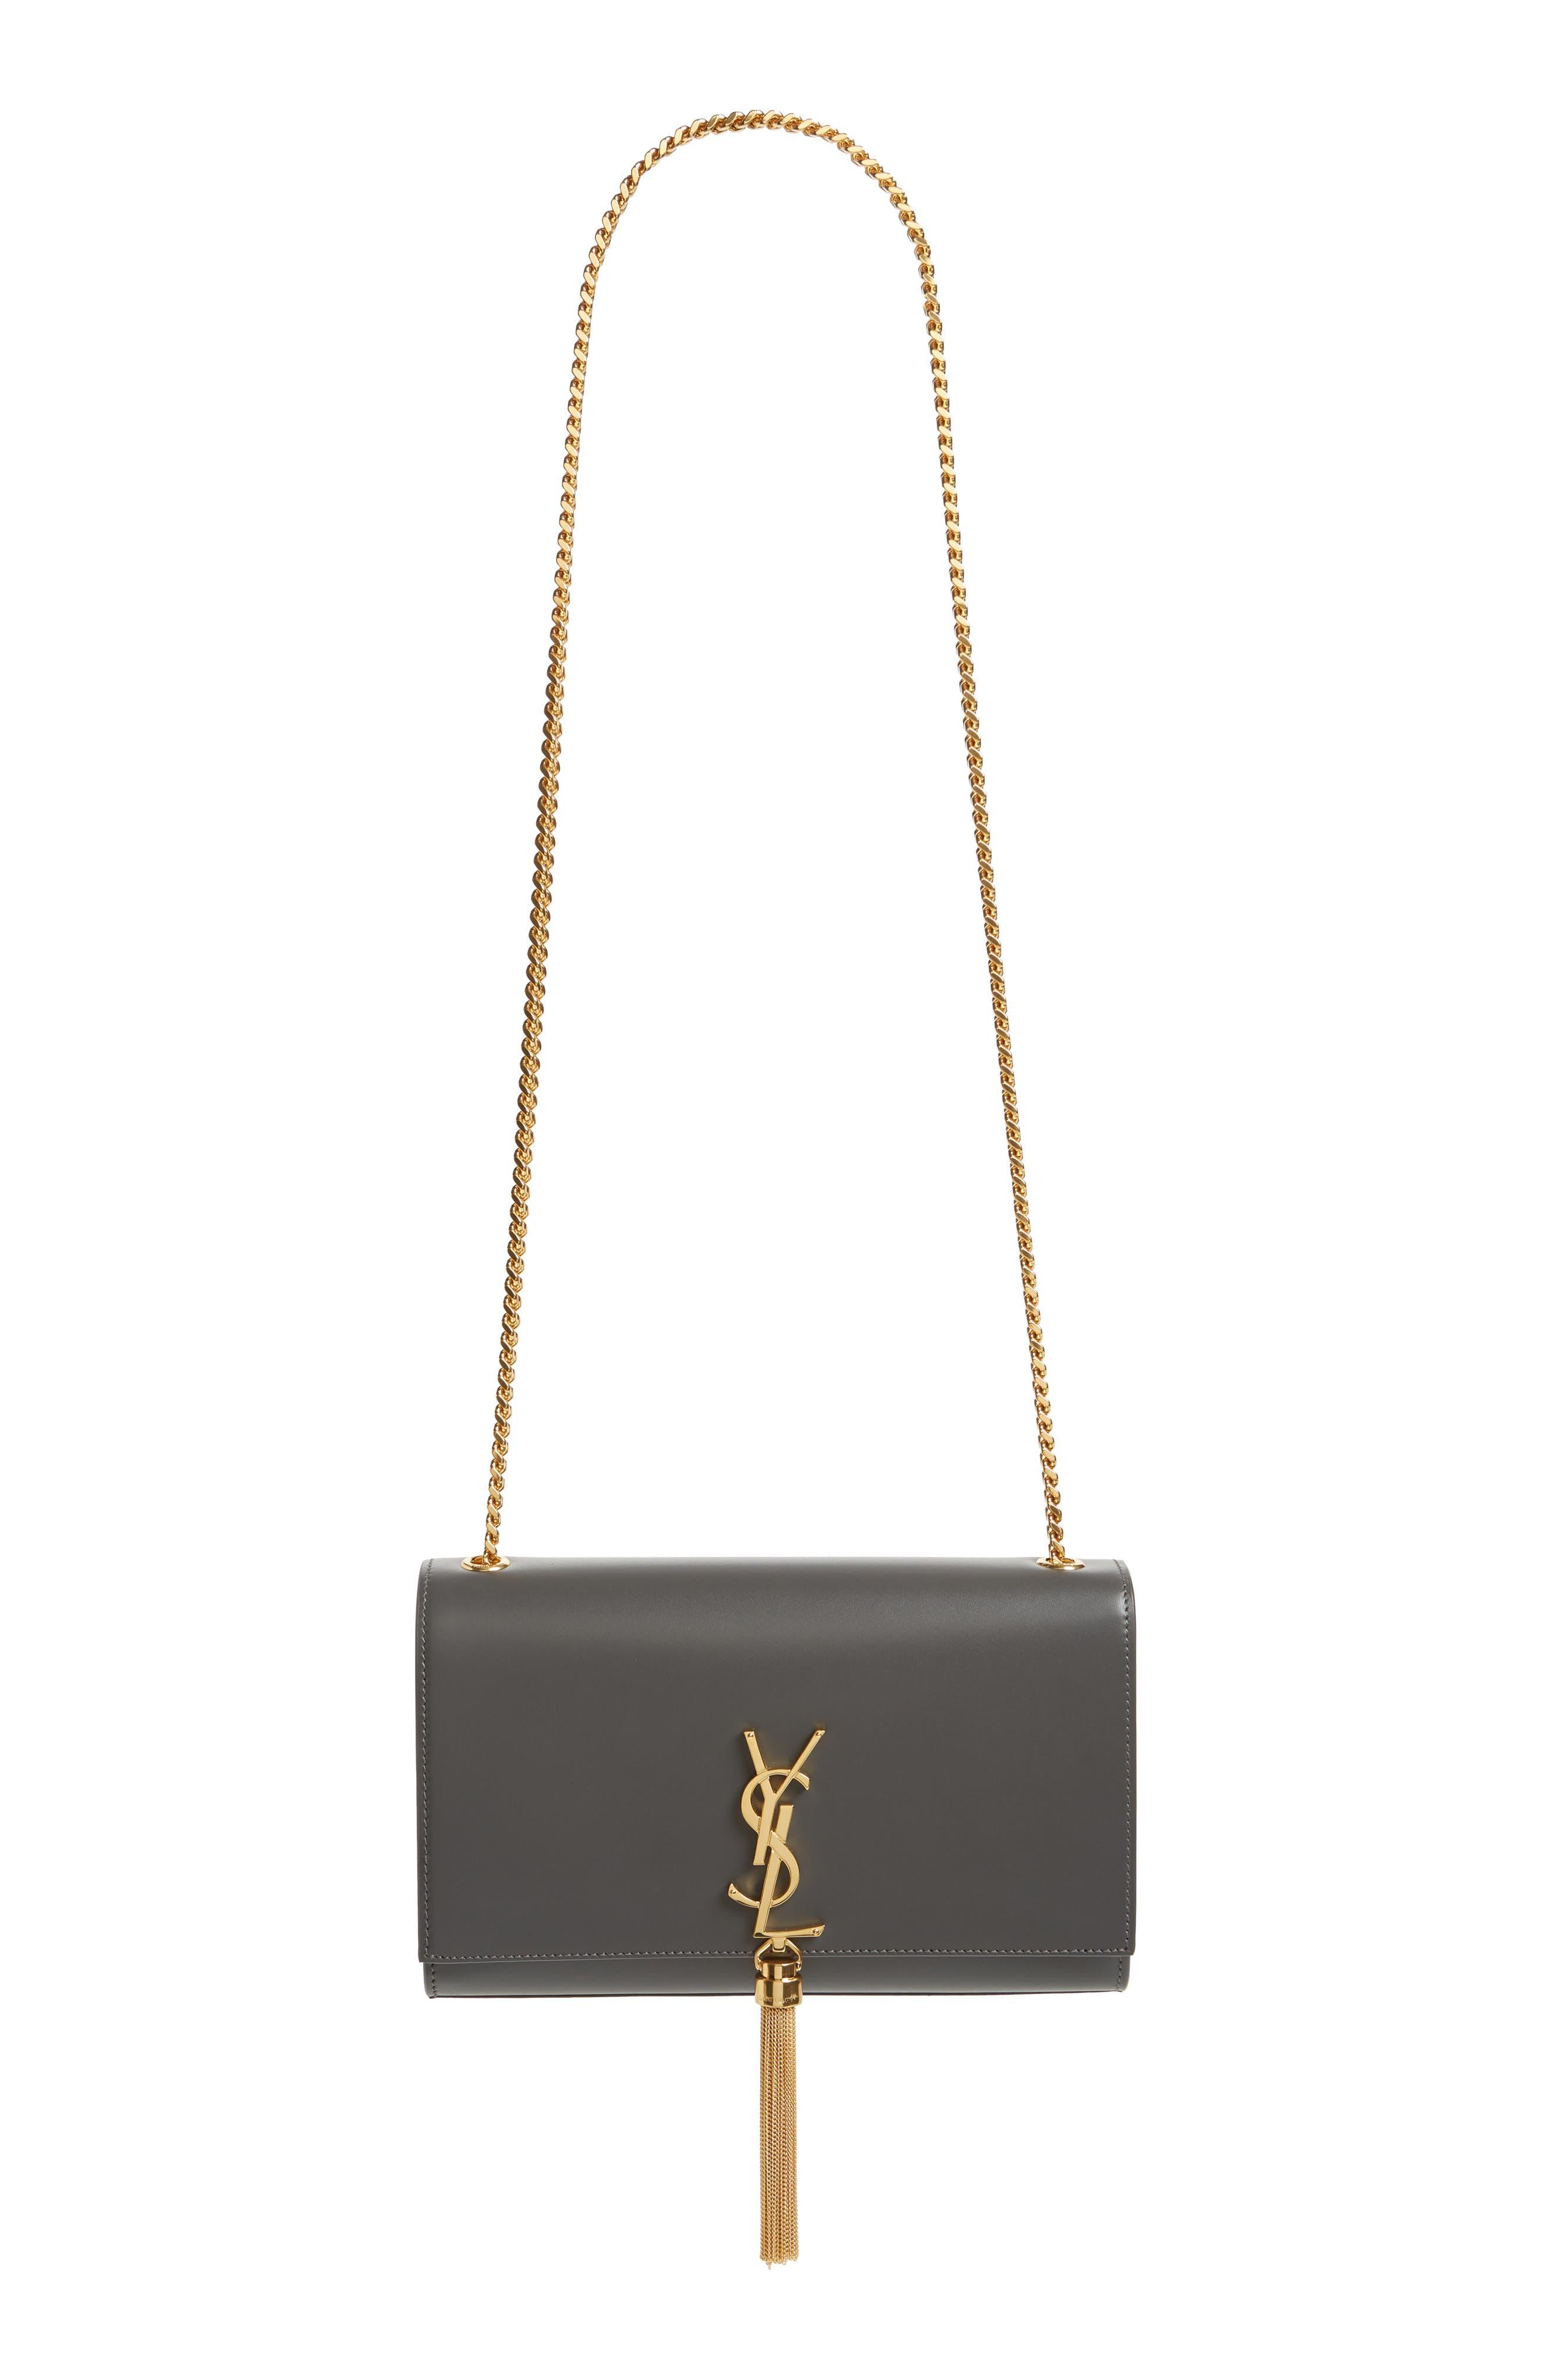 'Medium Monogram' Leather Shoulder Bag,                             Main thumbnail 1, color,                             STORM